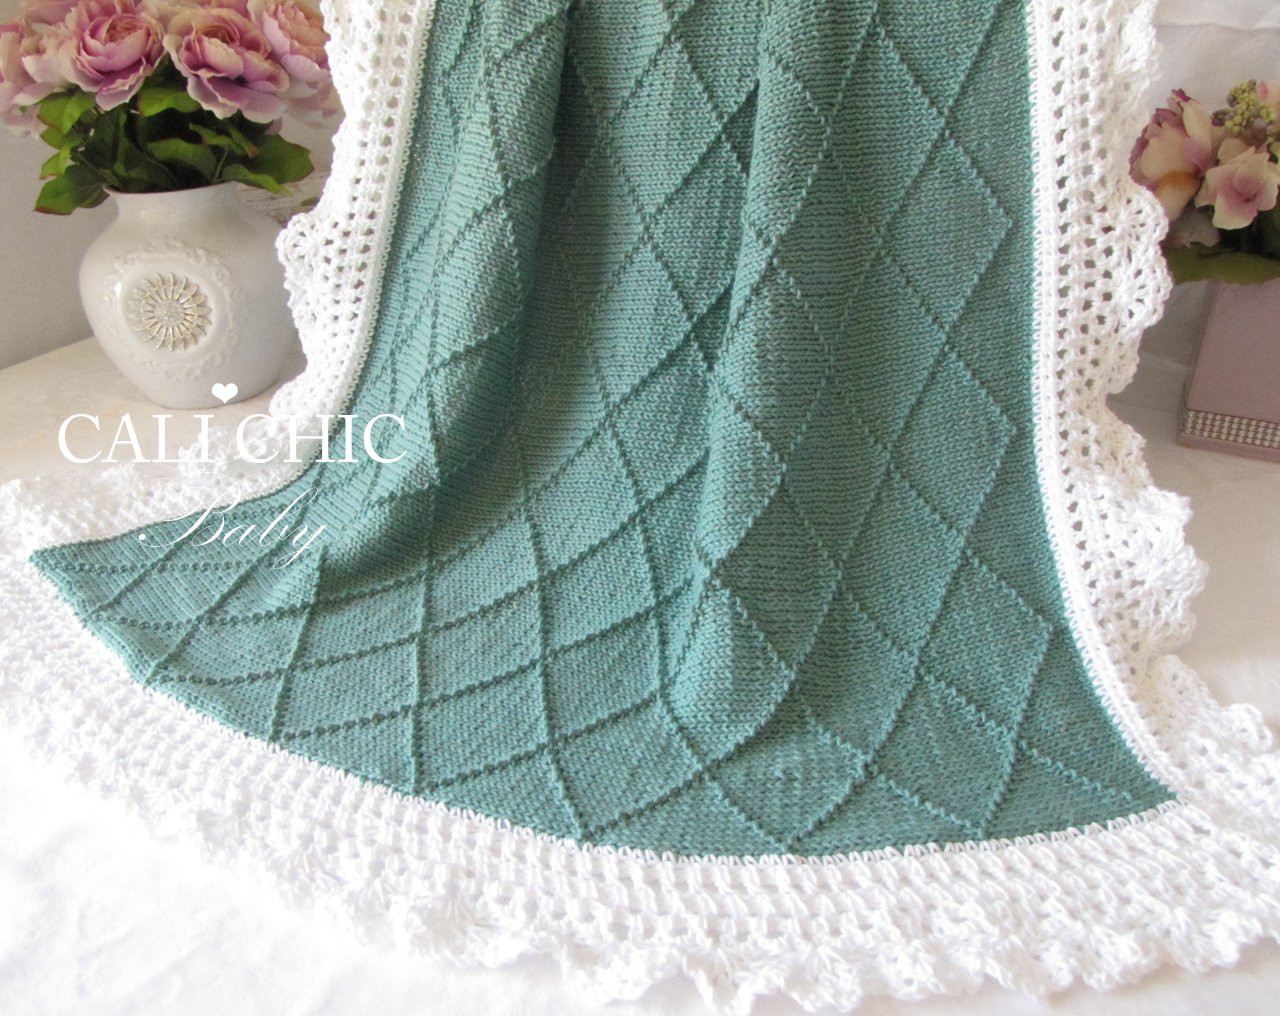 ParisKnitBaby BlanketPattern 63 | Cali Chic Baby